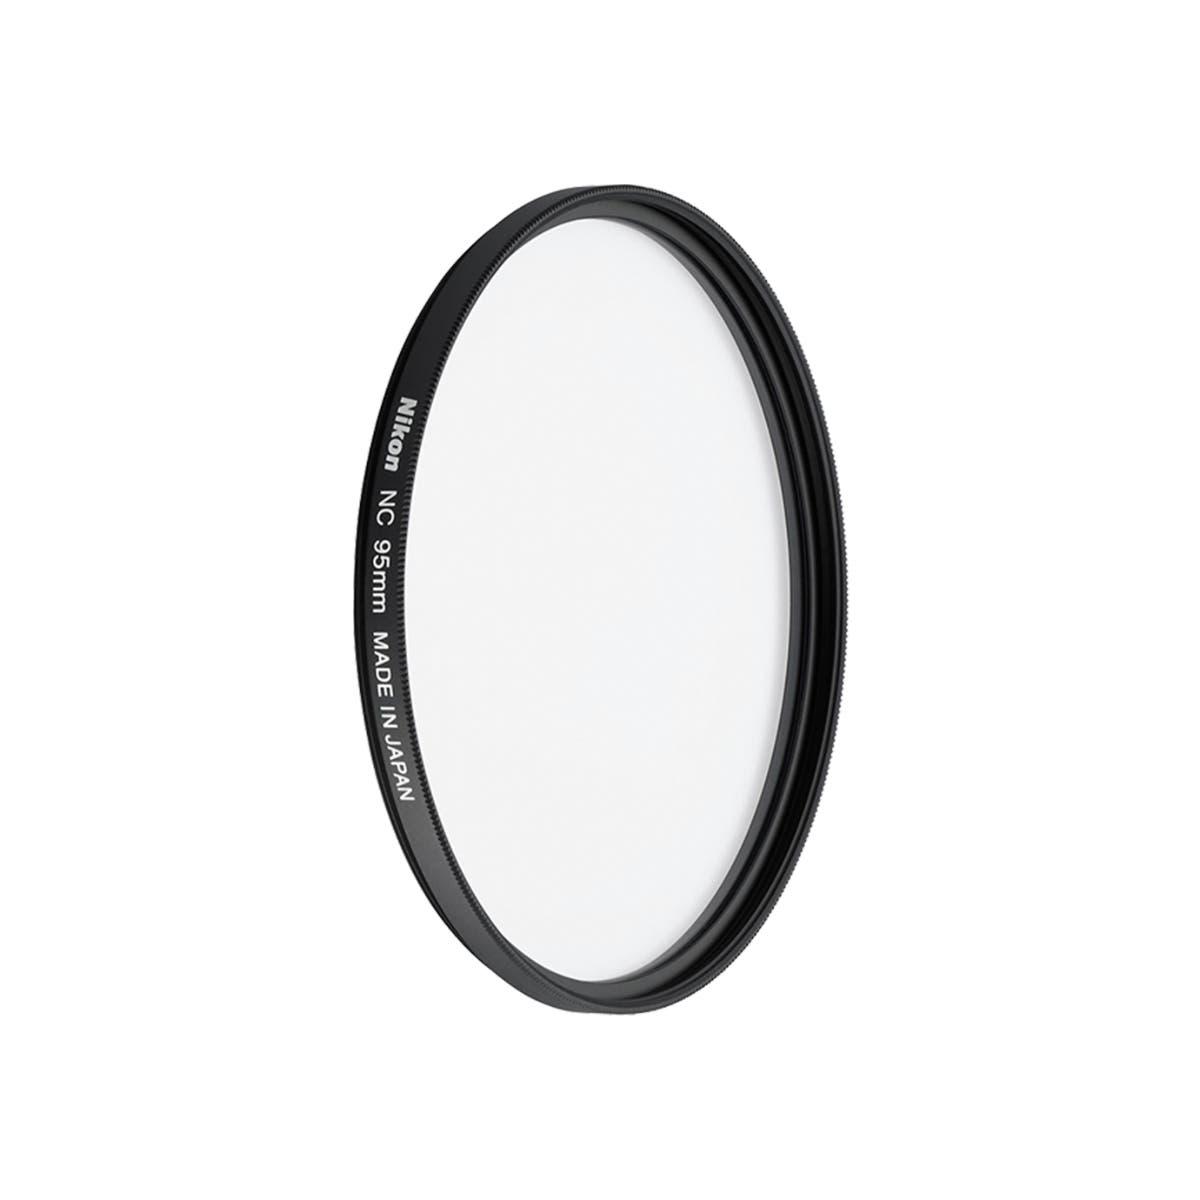 95mm NC Filter